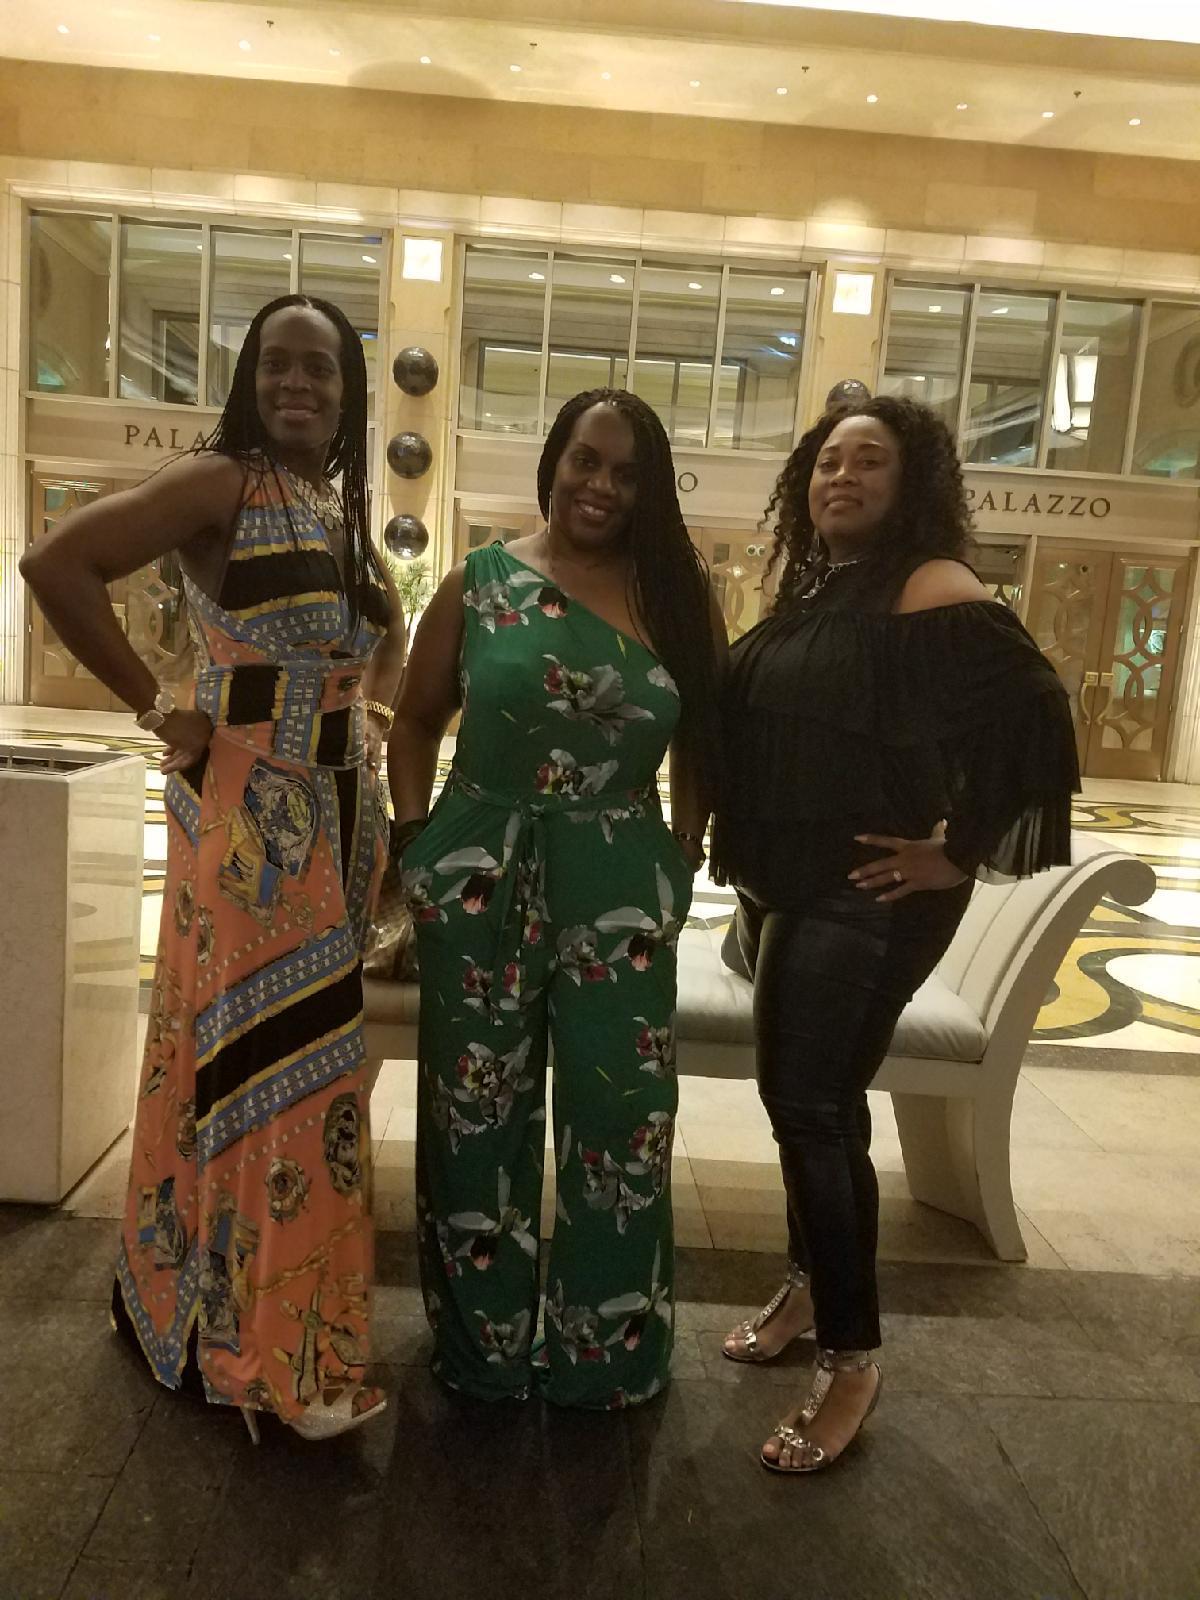 Florida girls invades Vegas